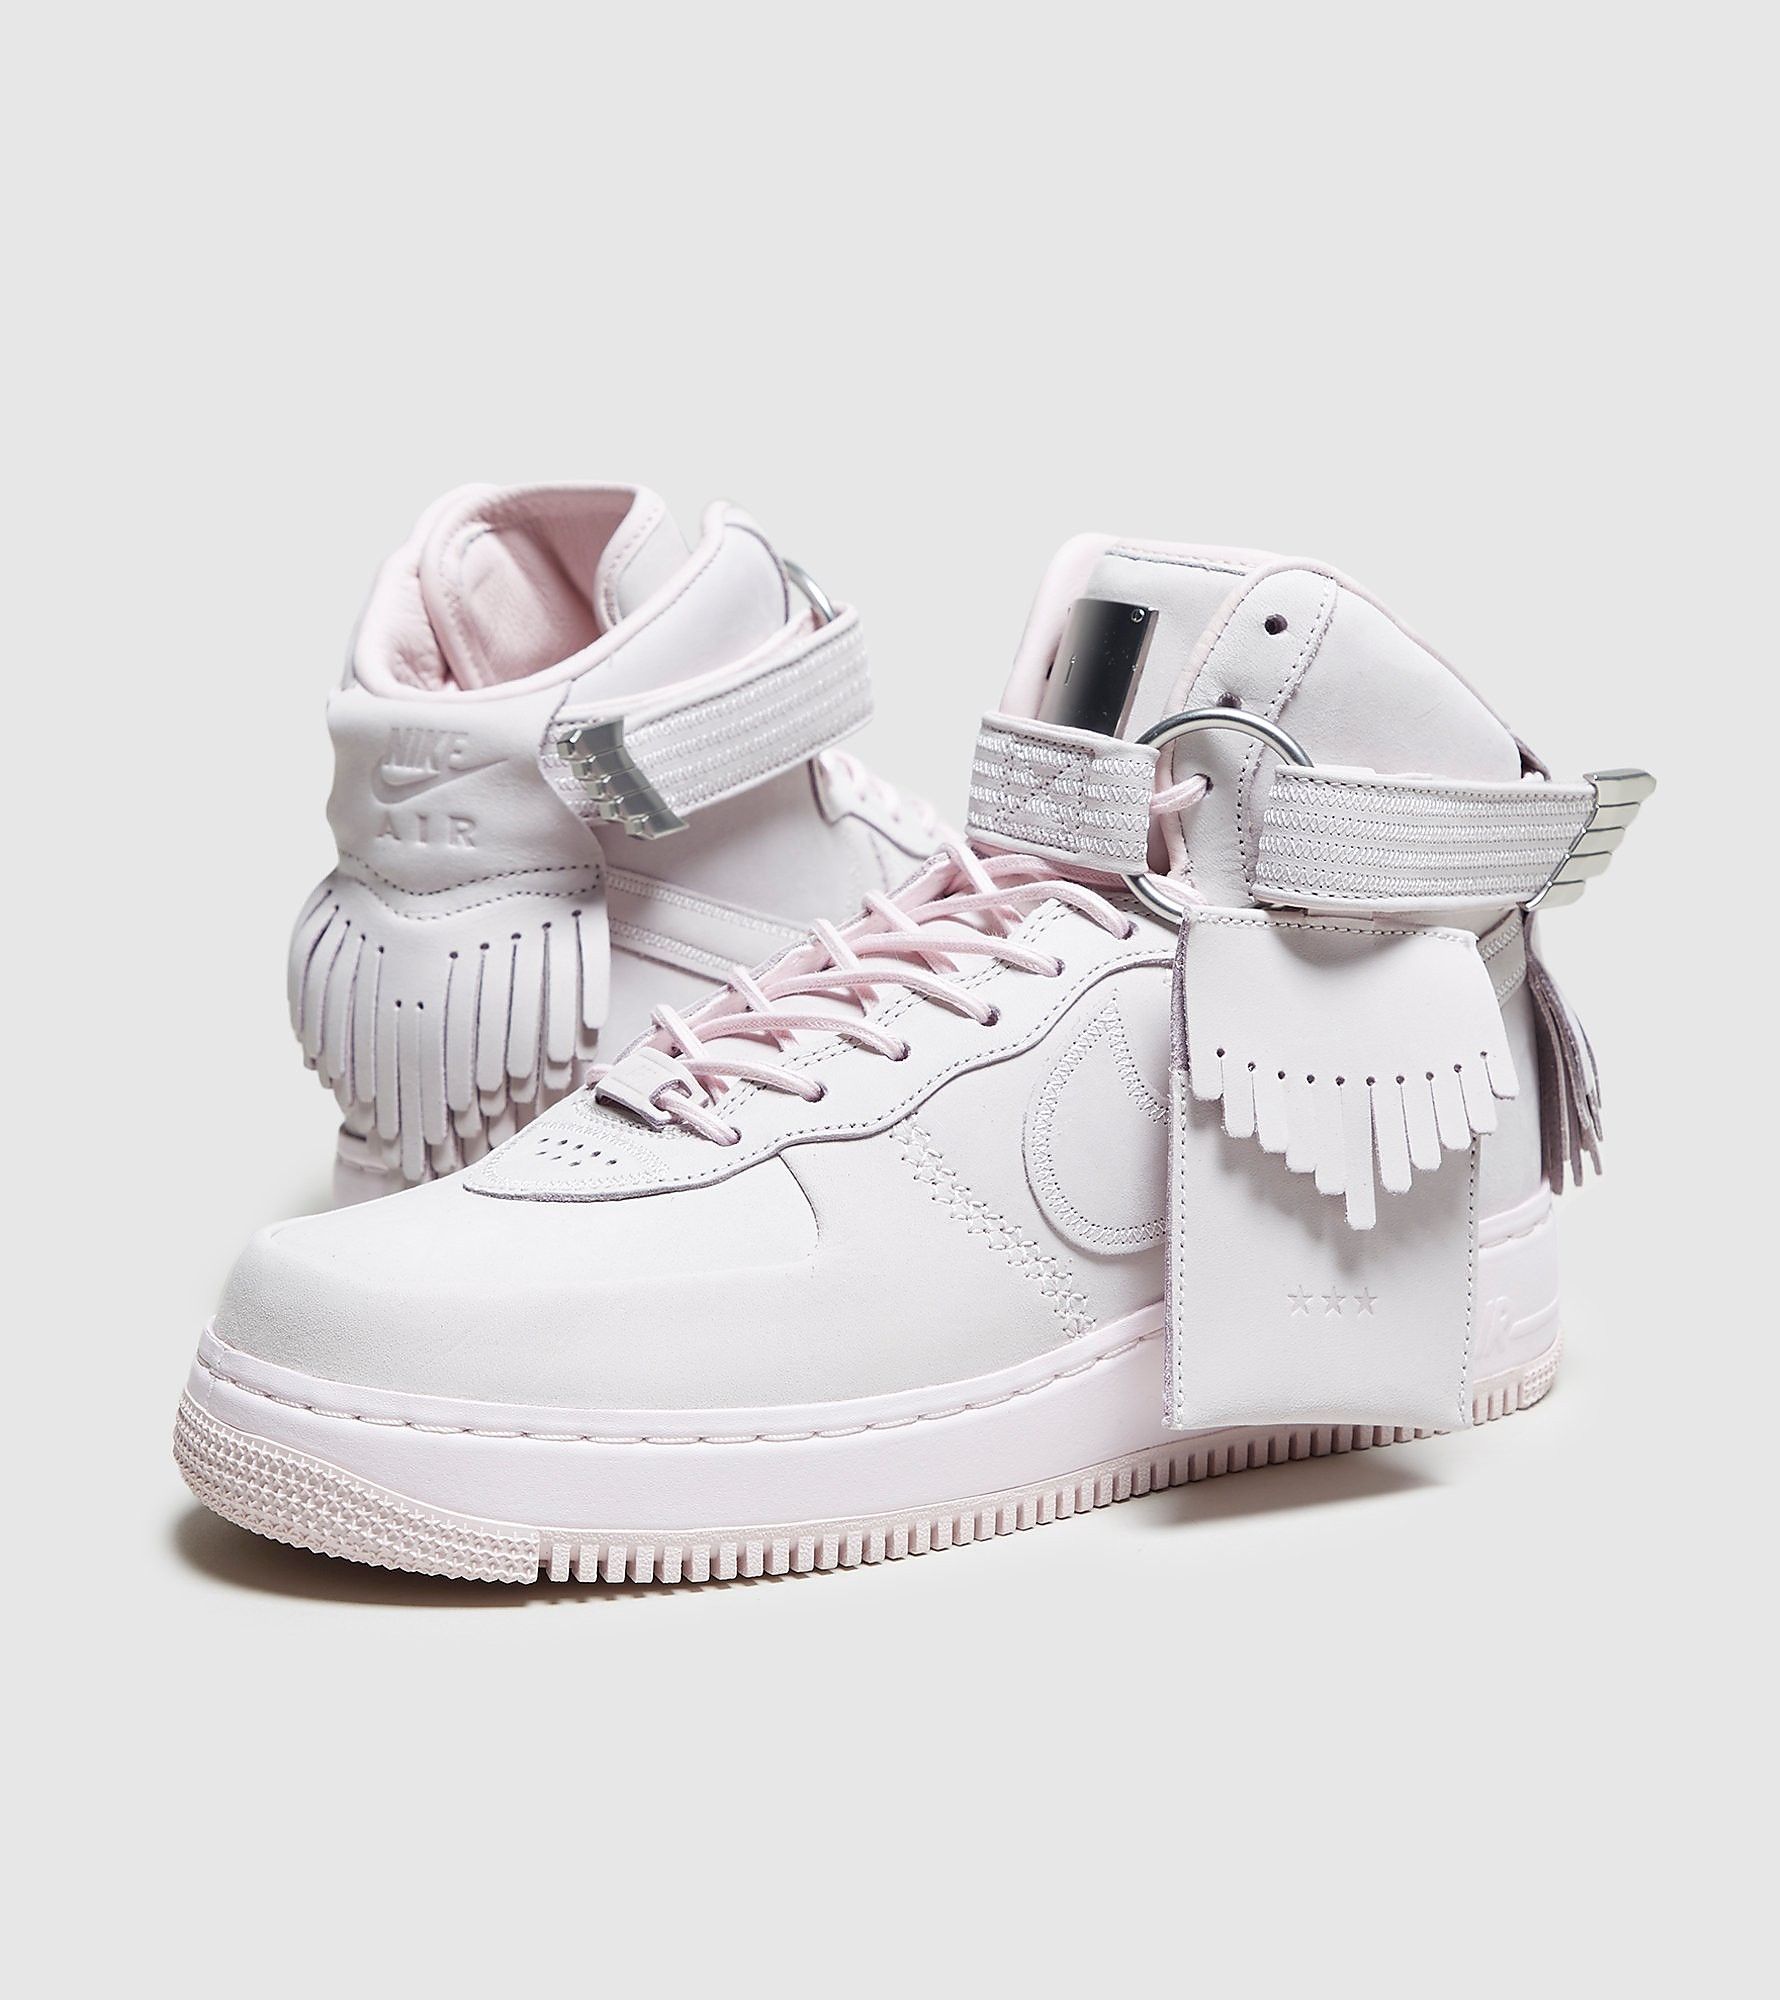 Nike Air Force 1 QS 'Easter'